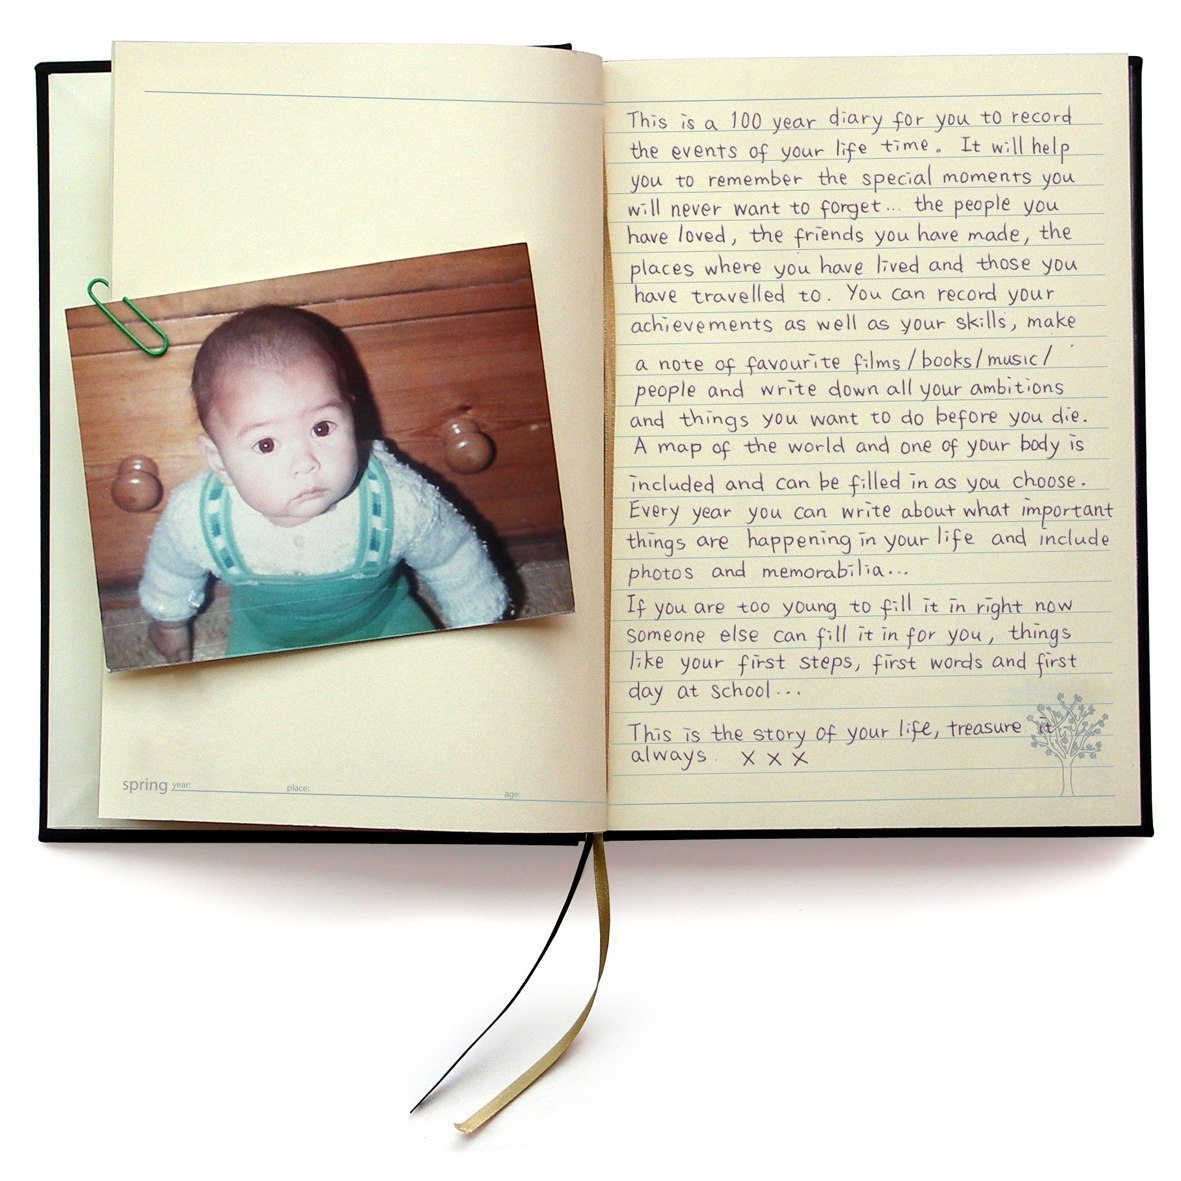 Dagbok - My Life Story